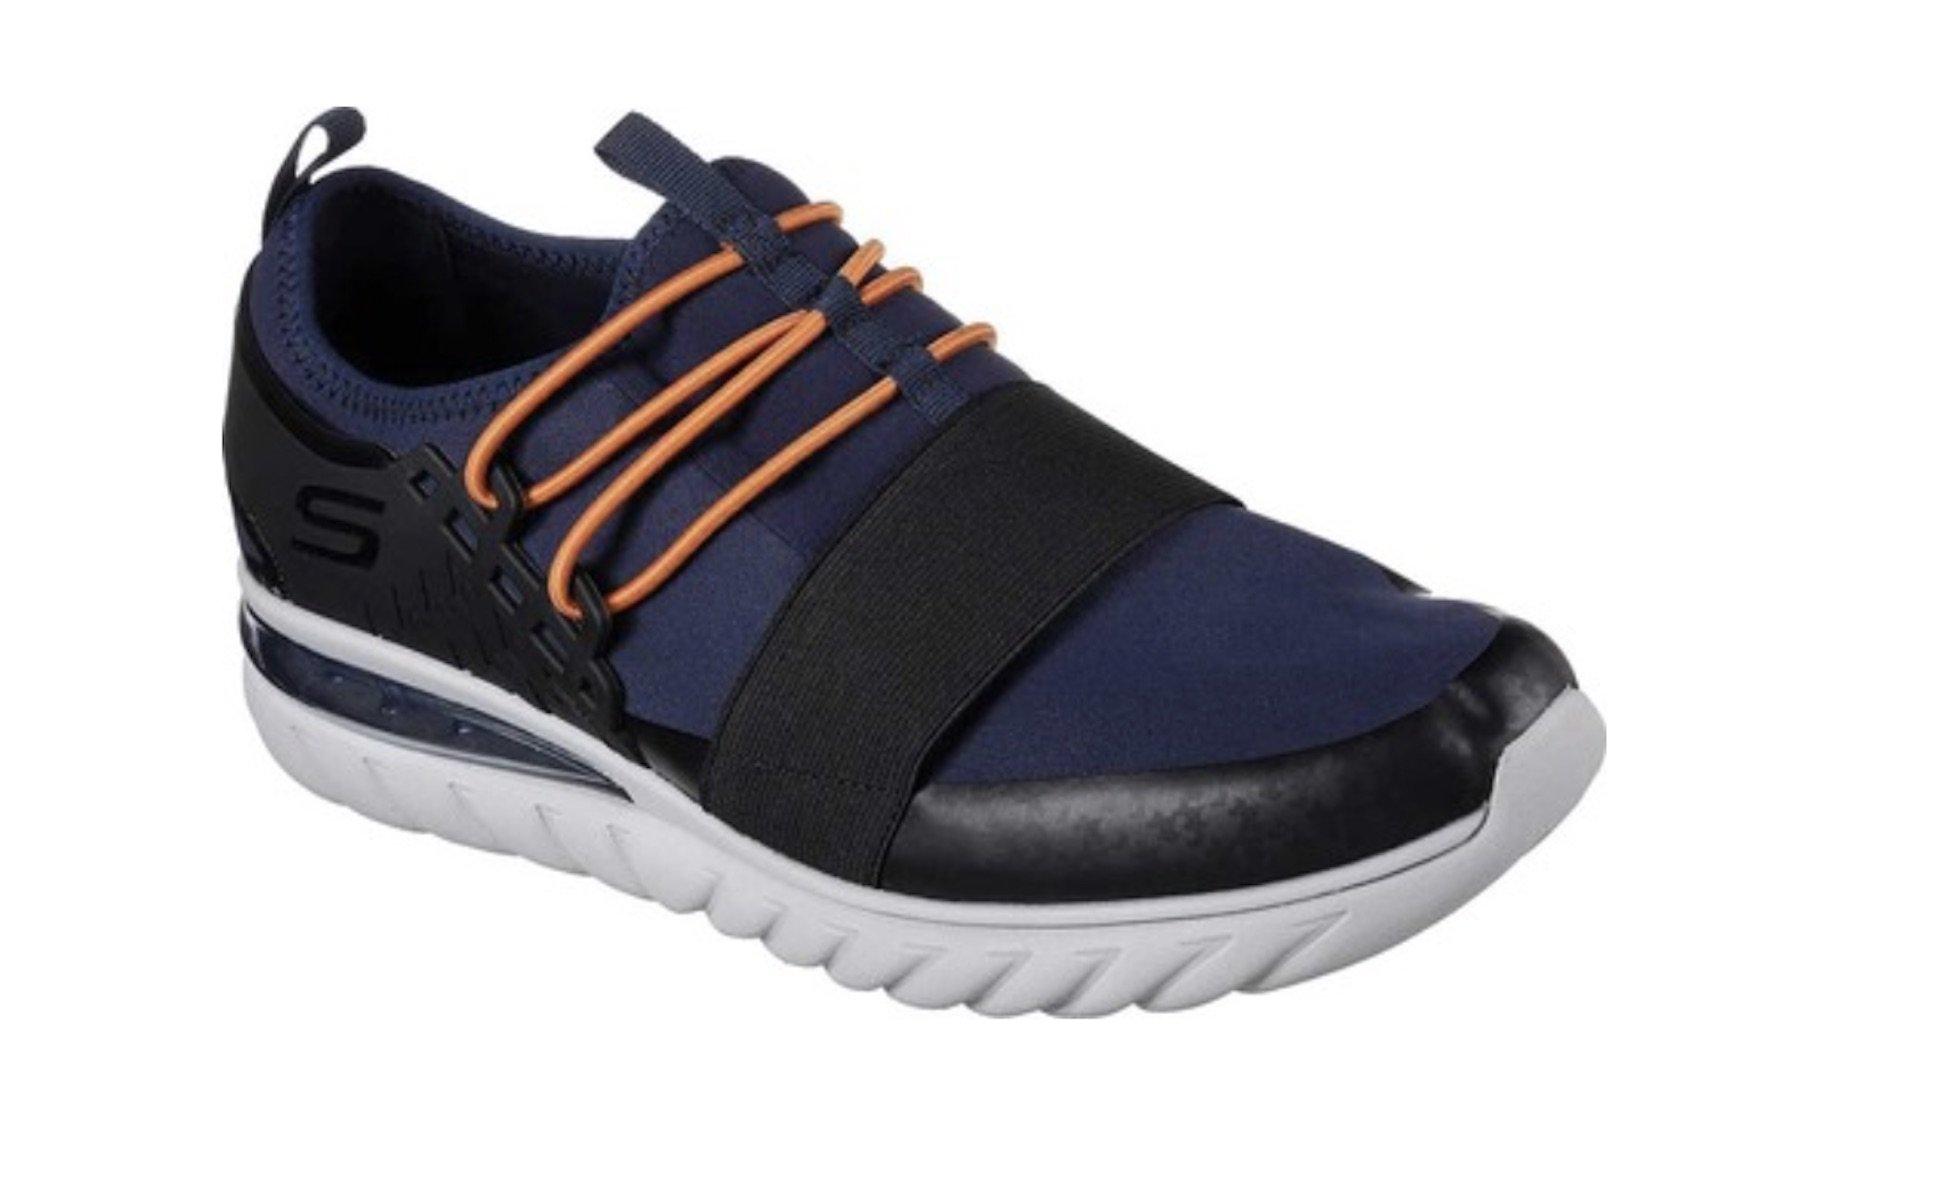 Skechers Skech-Air Conflux Men's Mesh Lightweight Slip On Shoes Navy Size 12